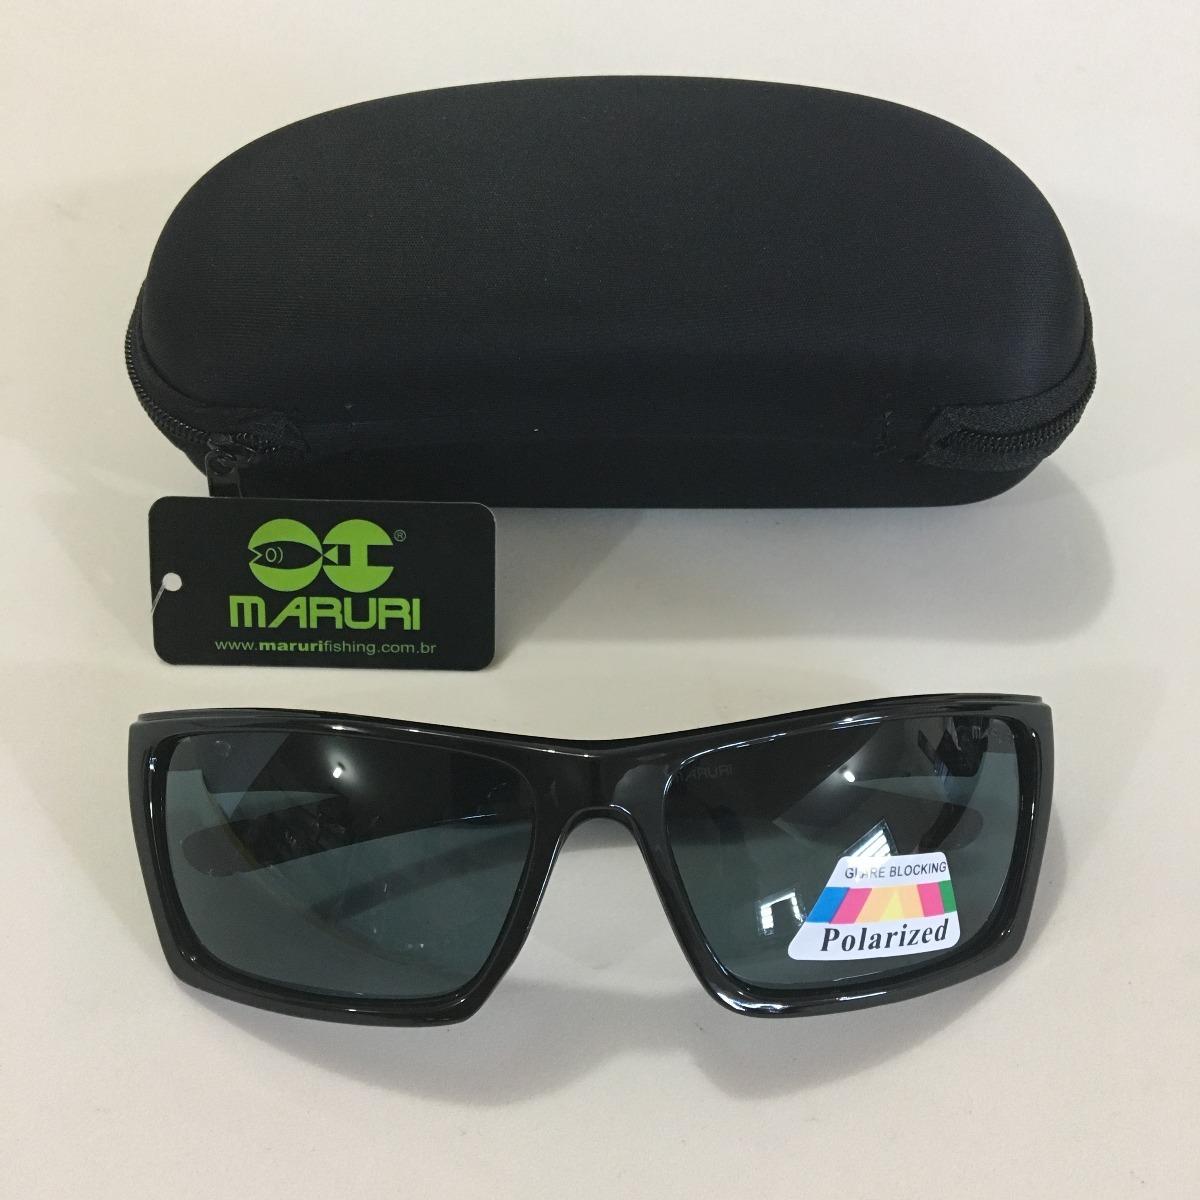 842b0d7fa óculos pesca maruri® polarizado anti-reflexo dz6510. Carregando zoom.